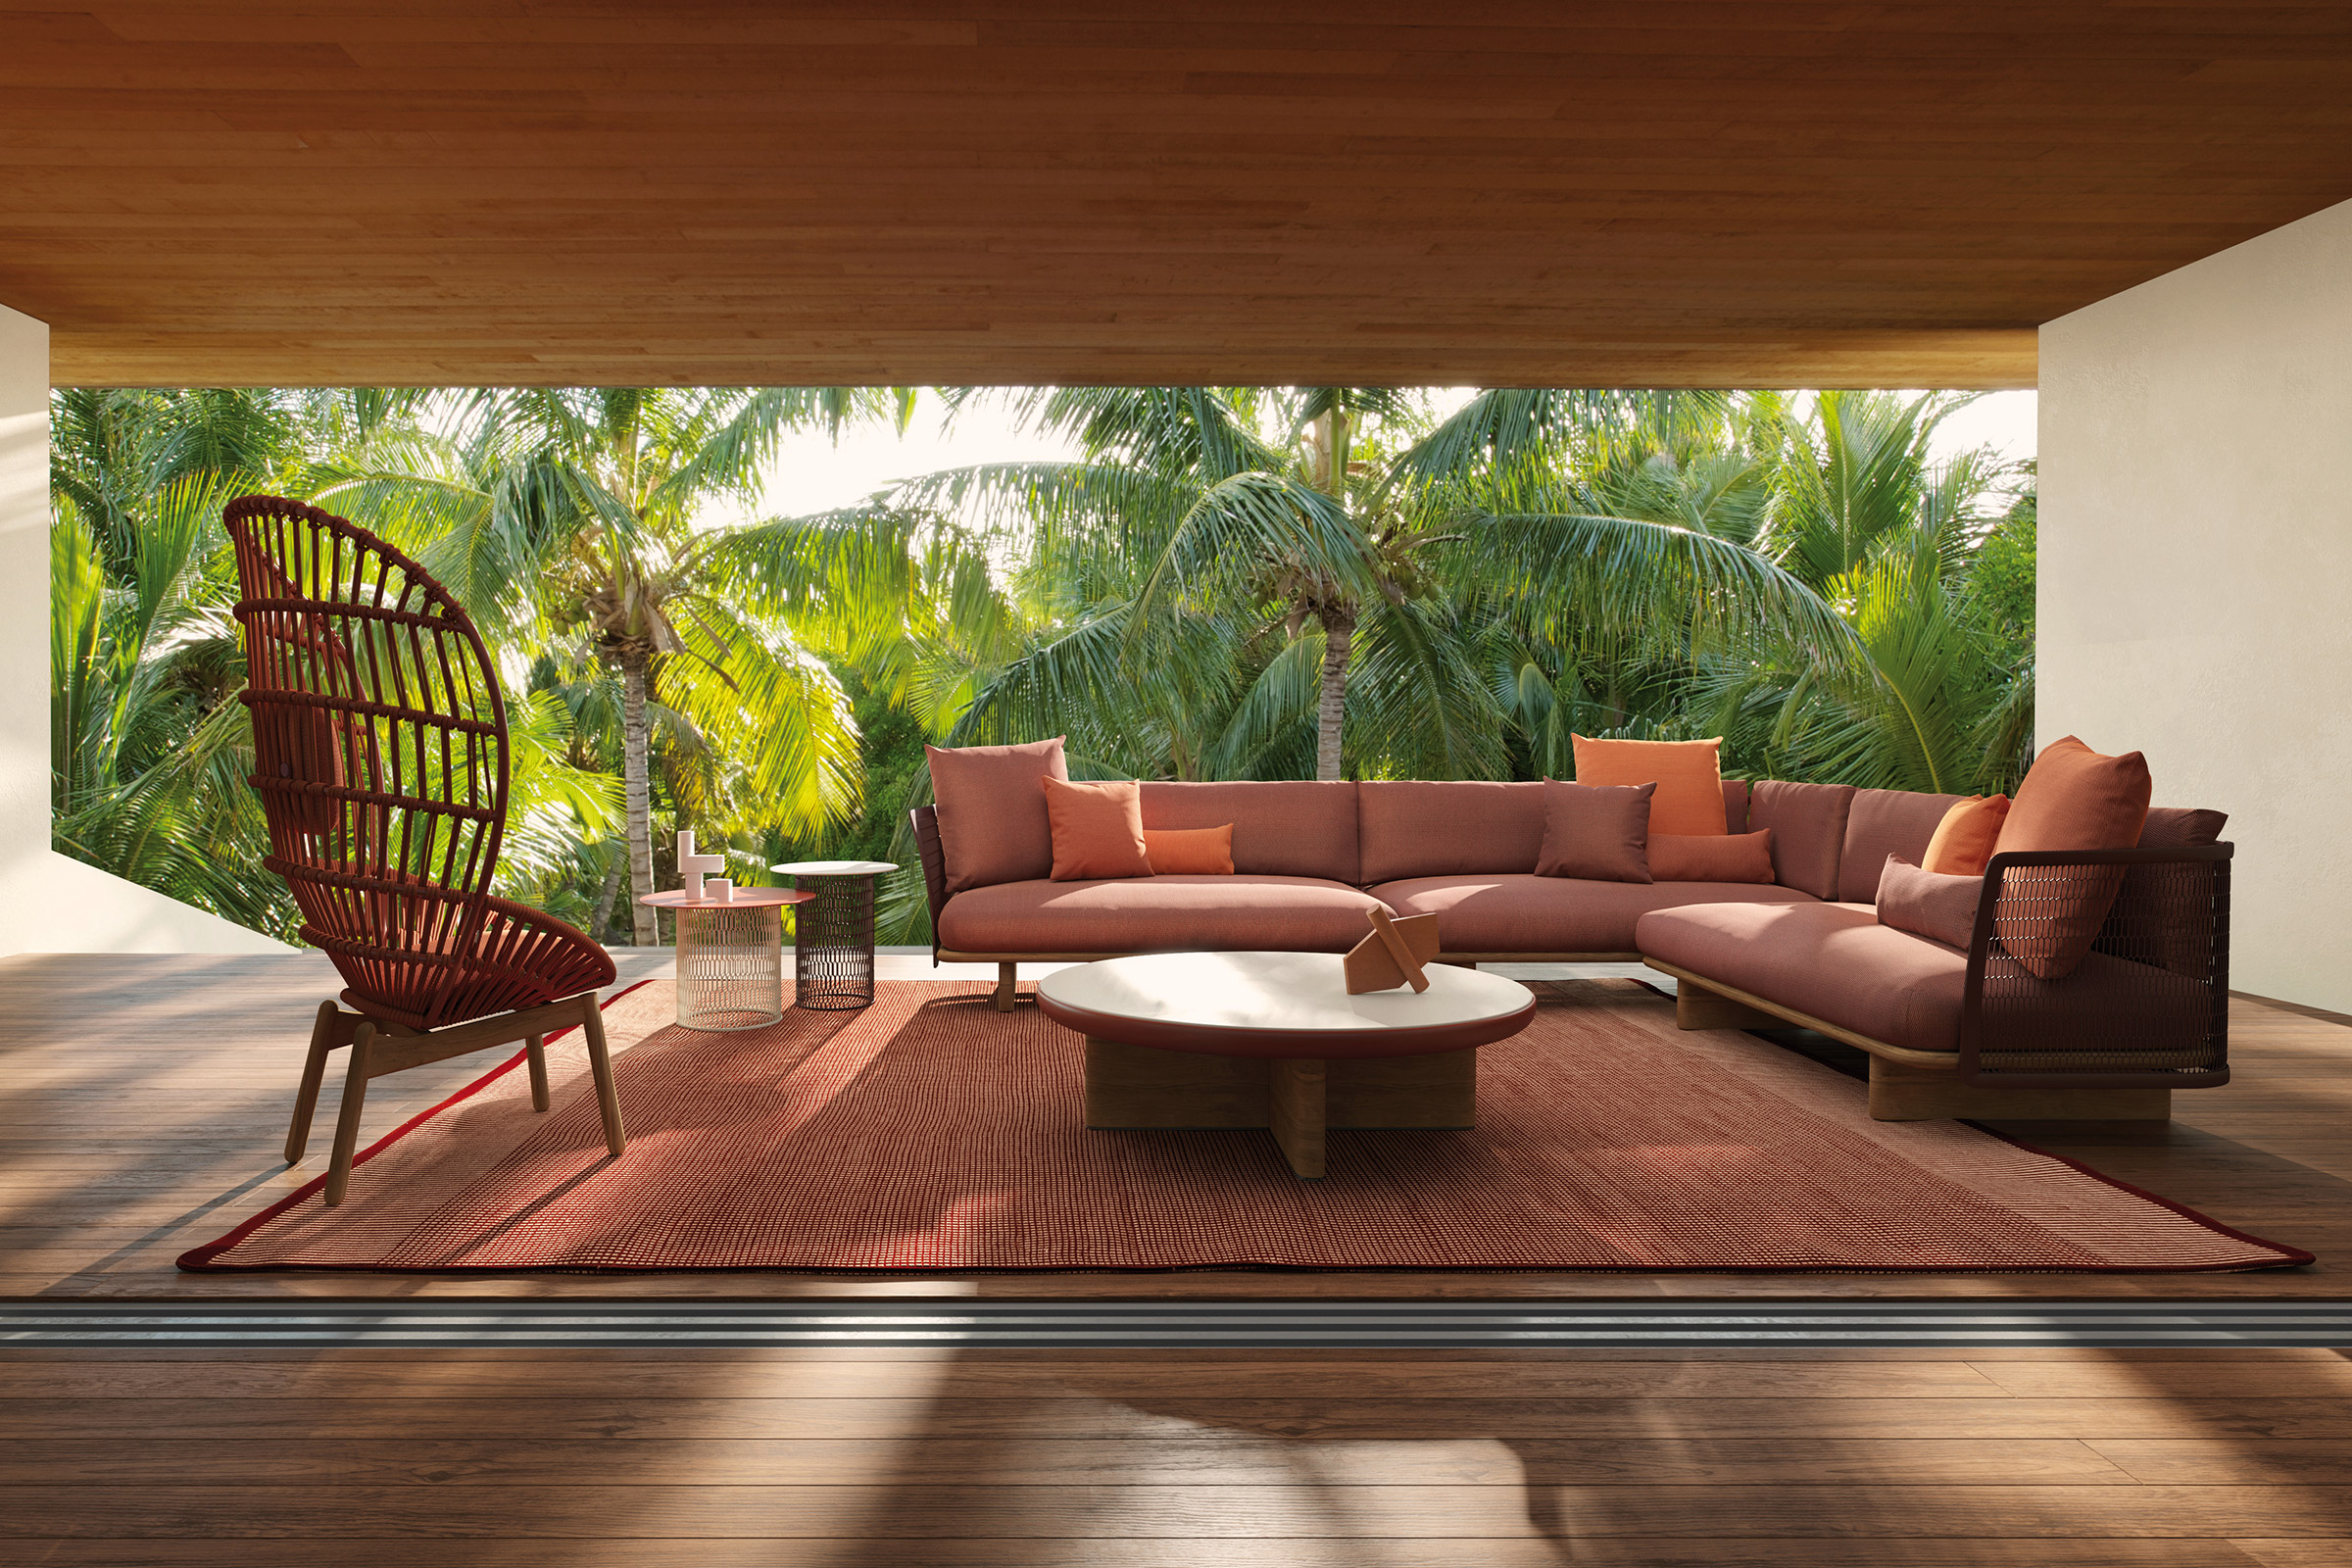 Cala outdoor furniture setting